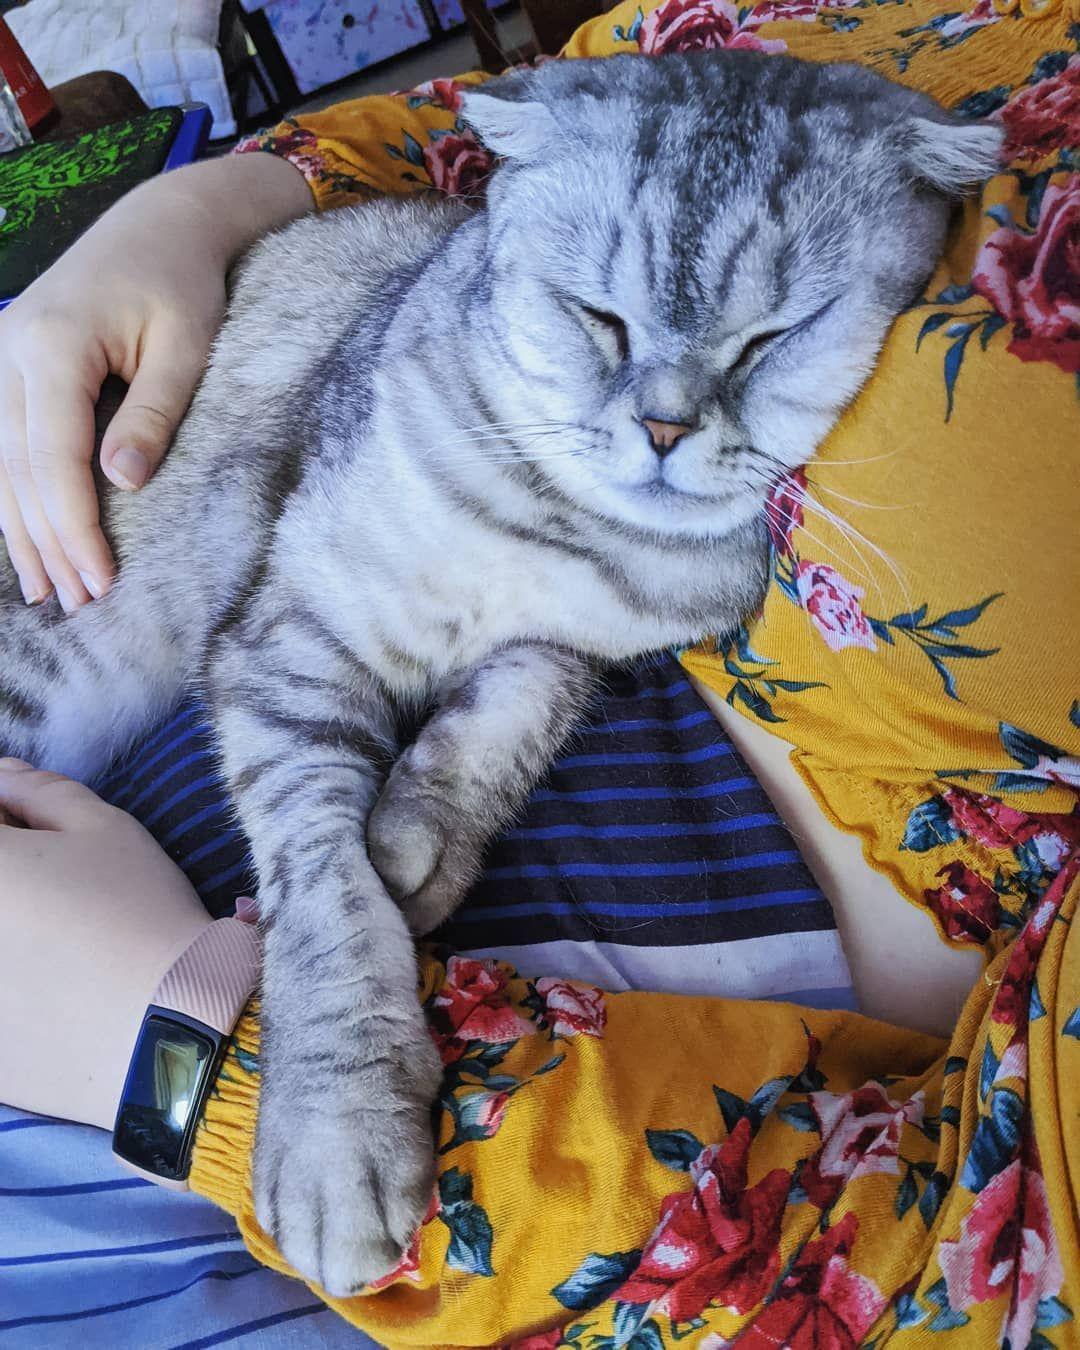 🐈🐾💗 Heaven 💗🐾🐈 • • • • • • •  #aw #scottishfold #scottish_fold #cat #aww #adorable #adorableanimals #cute #cuteanimals #meow #catsofinstagram #cats_of_instagram #cats_of_world #catsoftheweek #catsoftheday #instacat #instagram #animals #ilovemycat #kitty #kittys #petsagram #catlover #catlovers #pet #petsofinsta #worldofcutepets #petsofinstagram #instagood #followme